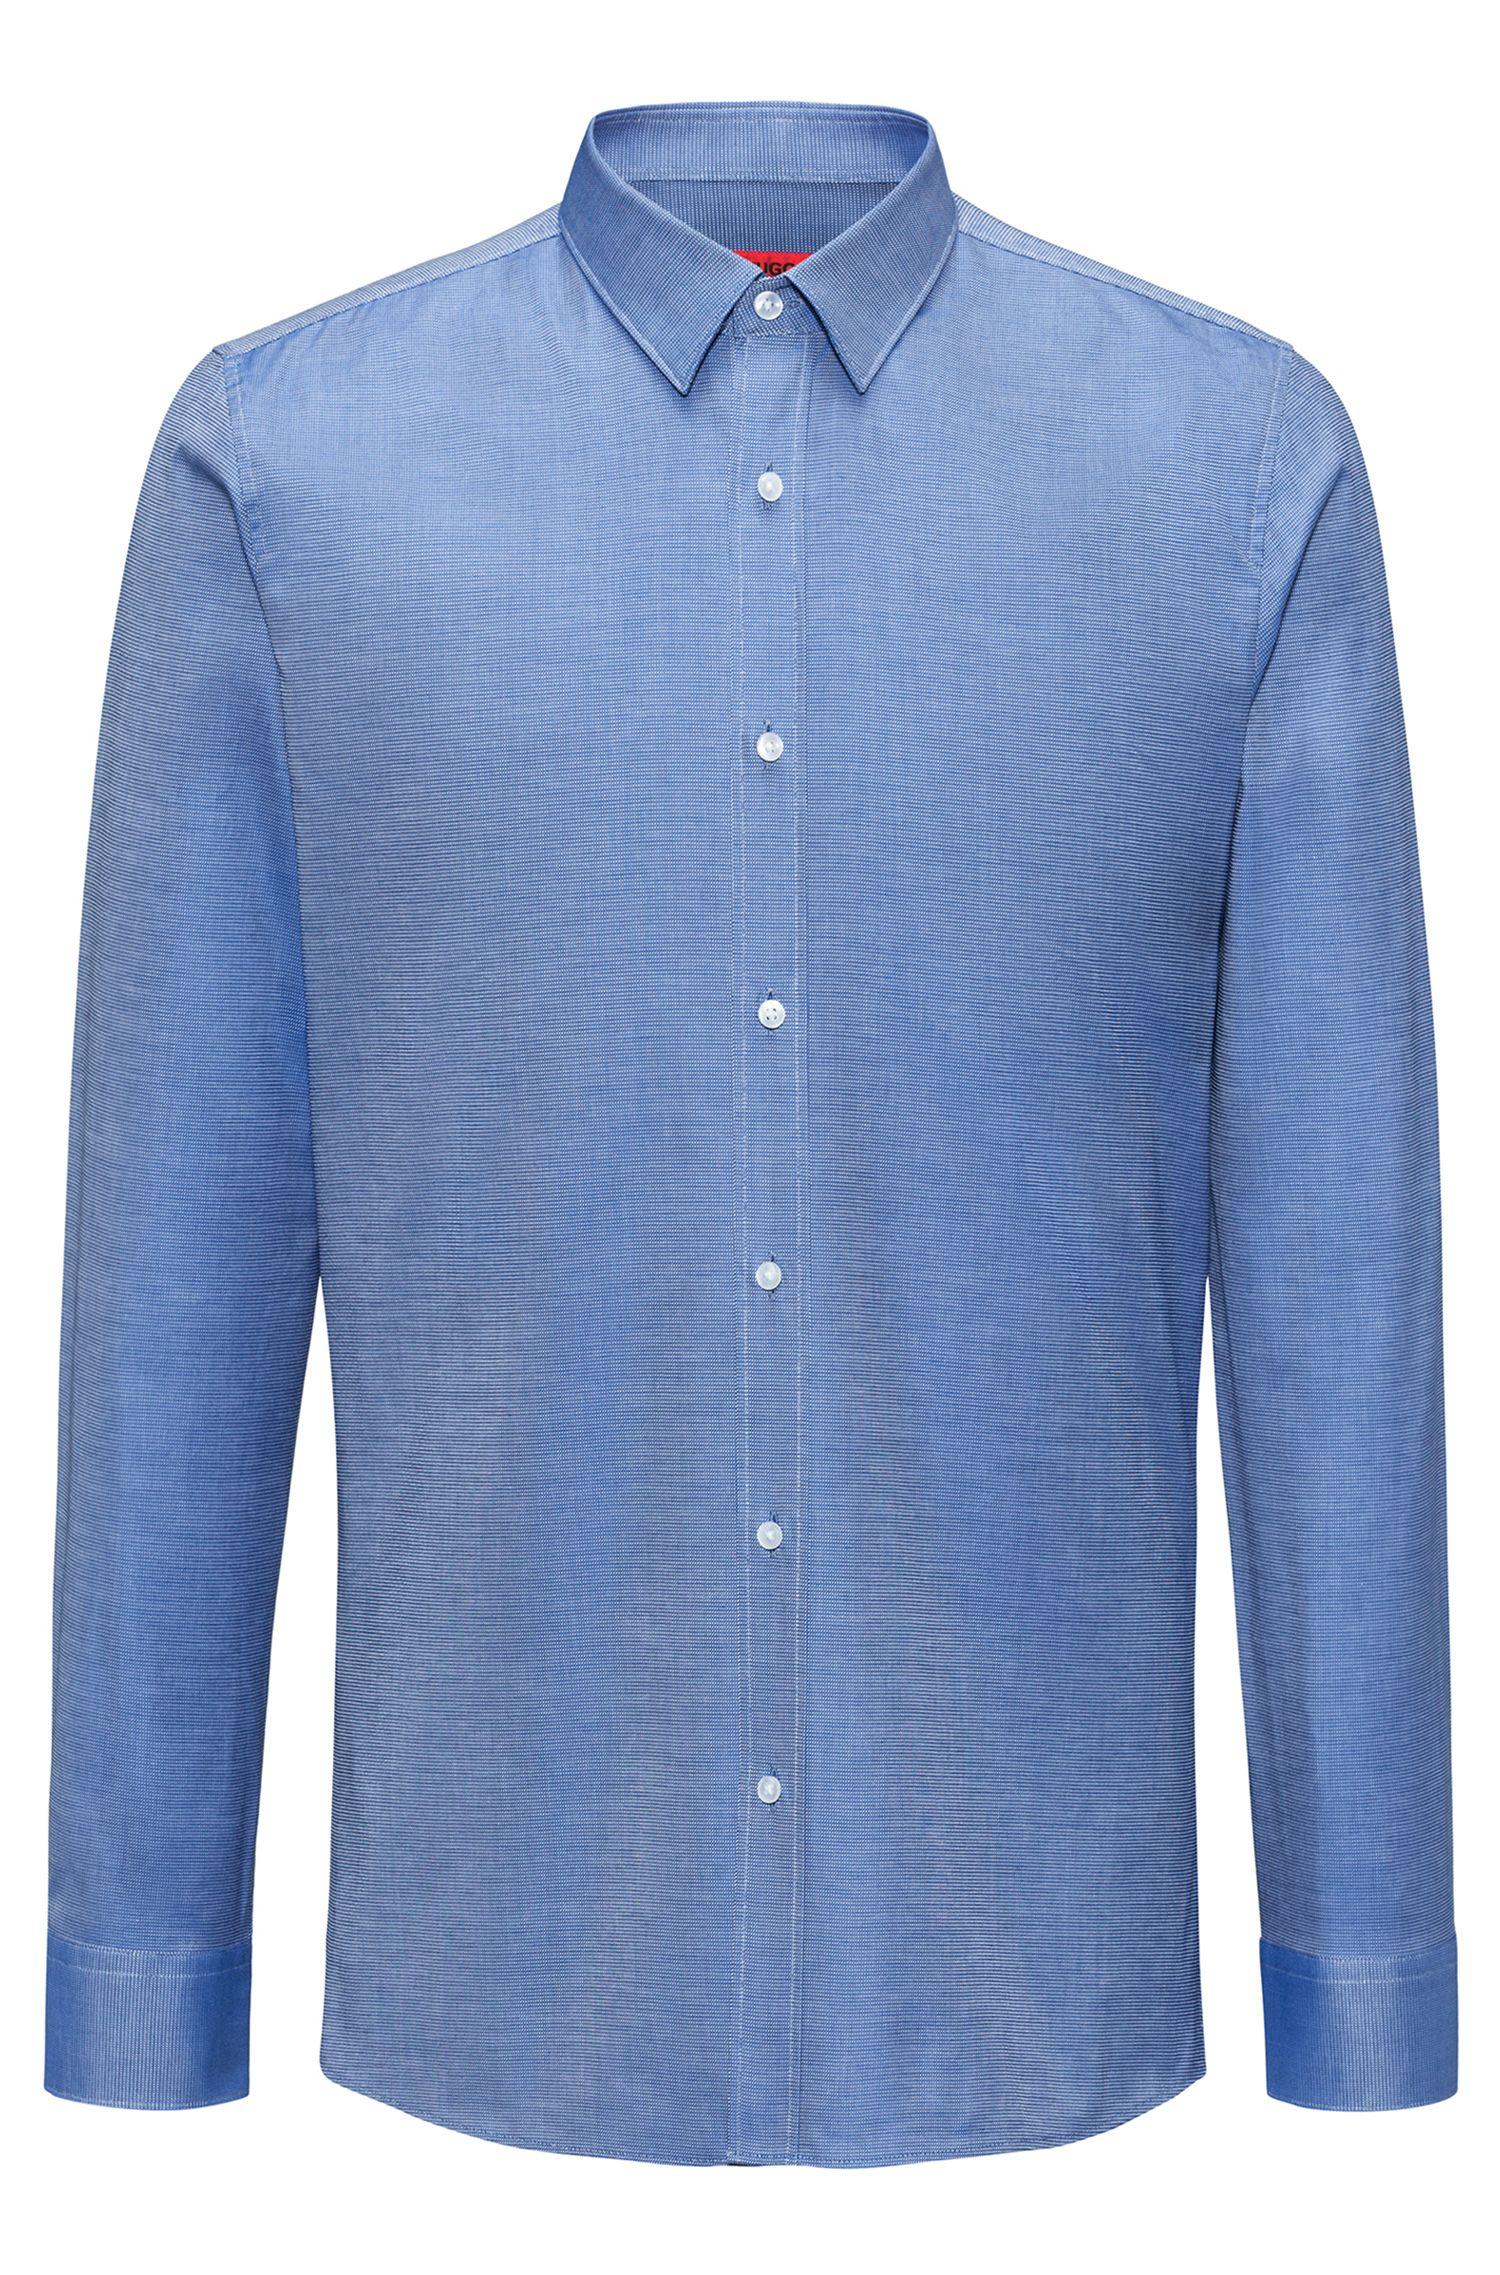 Pindot Cotton Dress Shirt, Extra Slim Fit | Elisha, Dark Blue